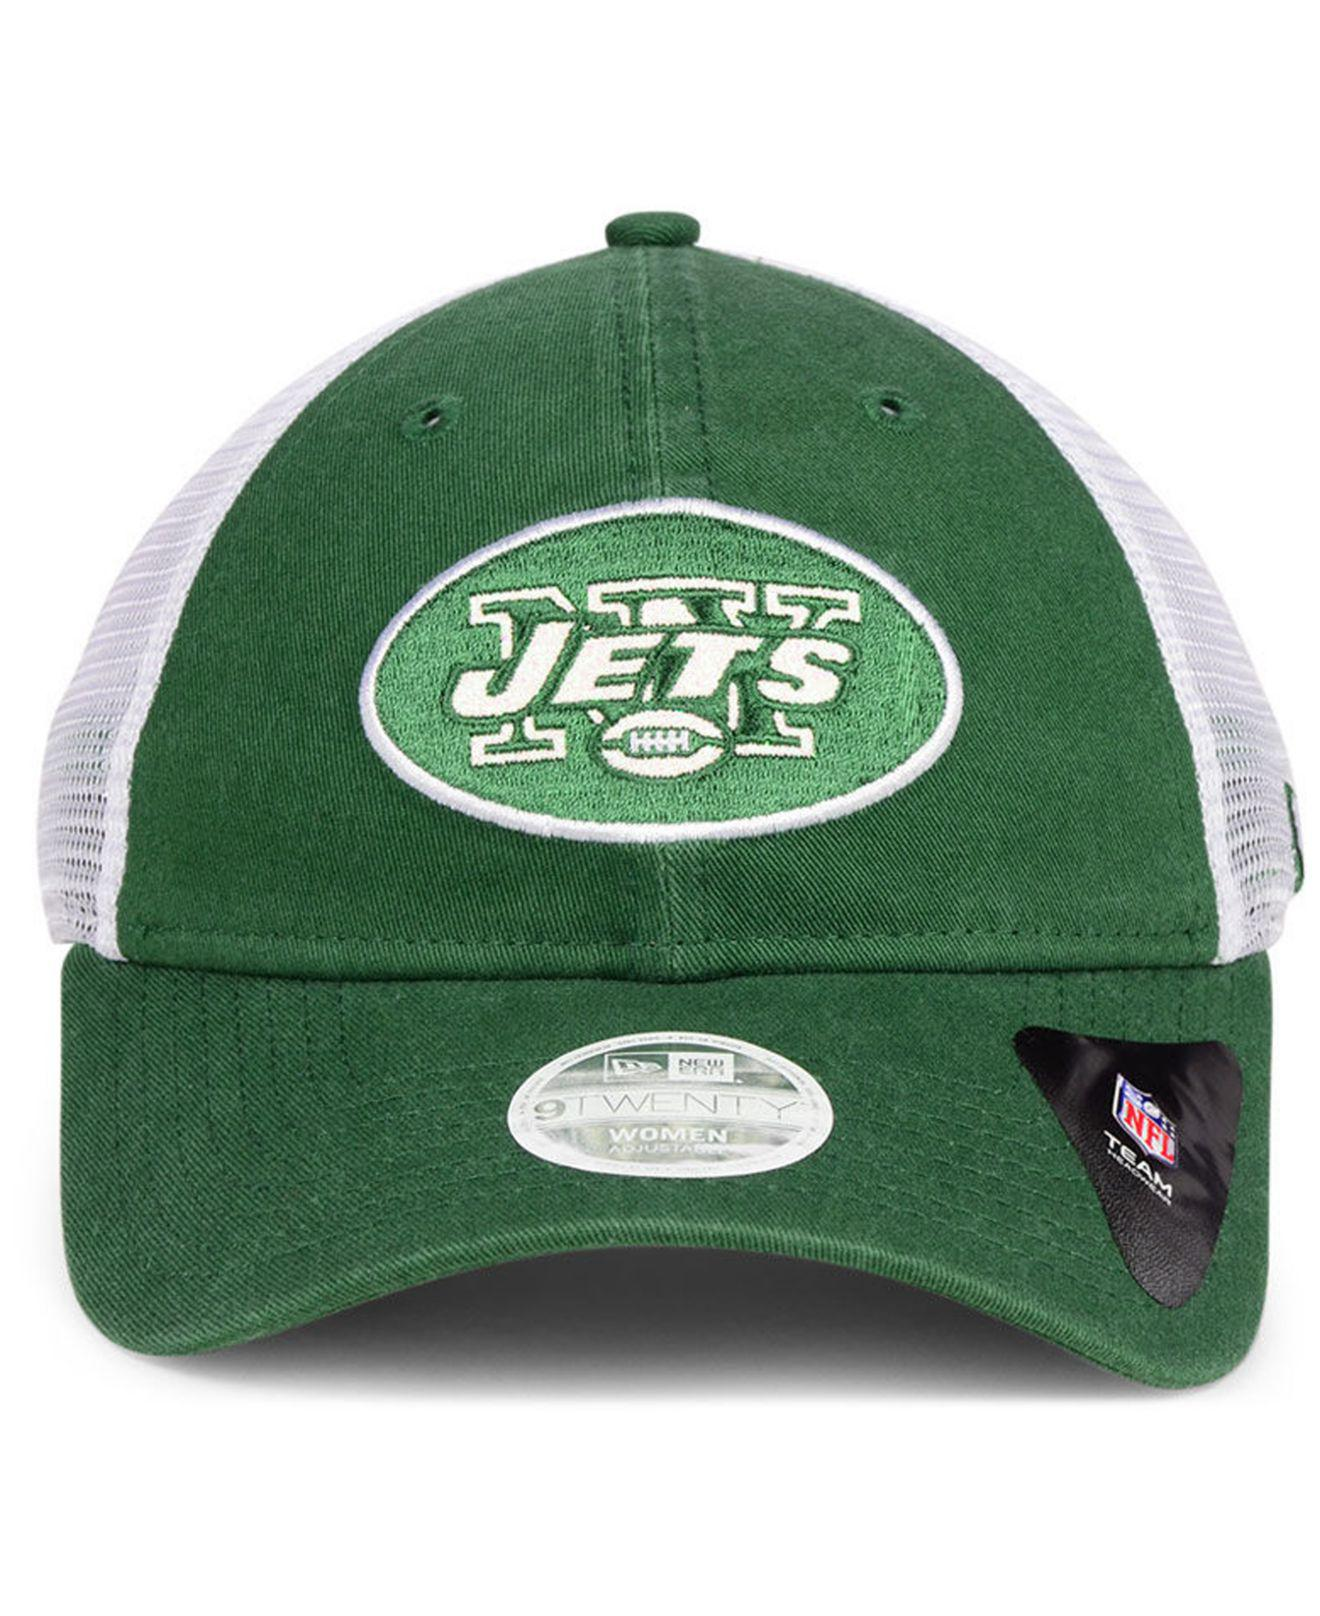 d8447612f79 Lyst - Ktz New York Jets Trucker Shine 9twenty Cap in Green